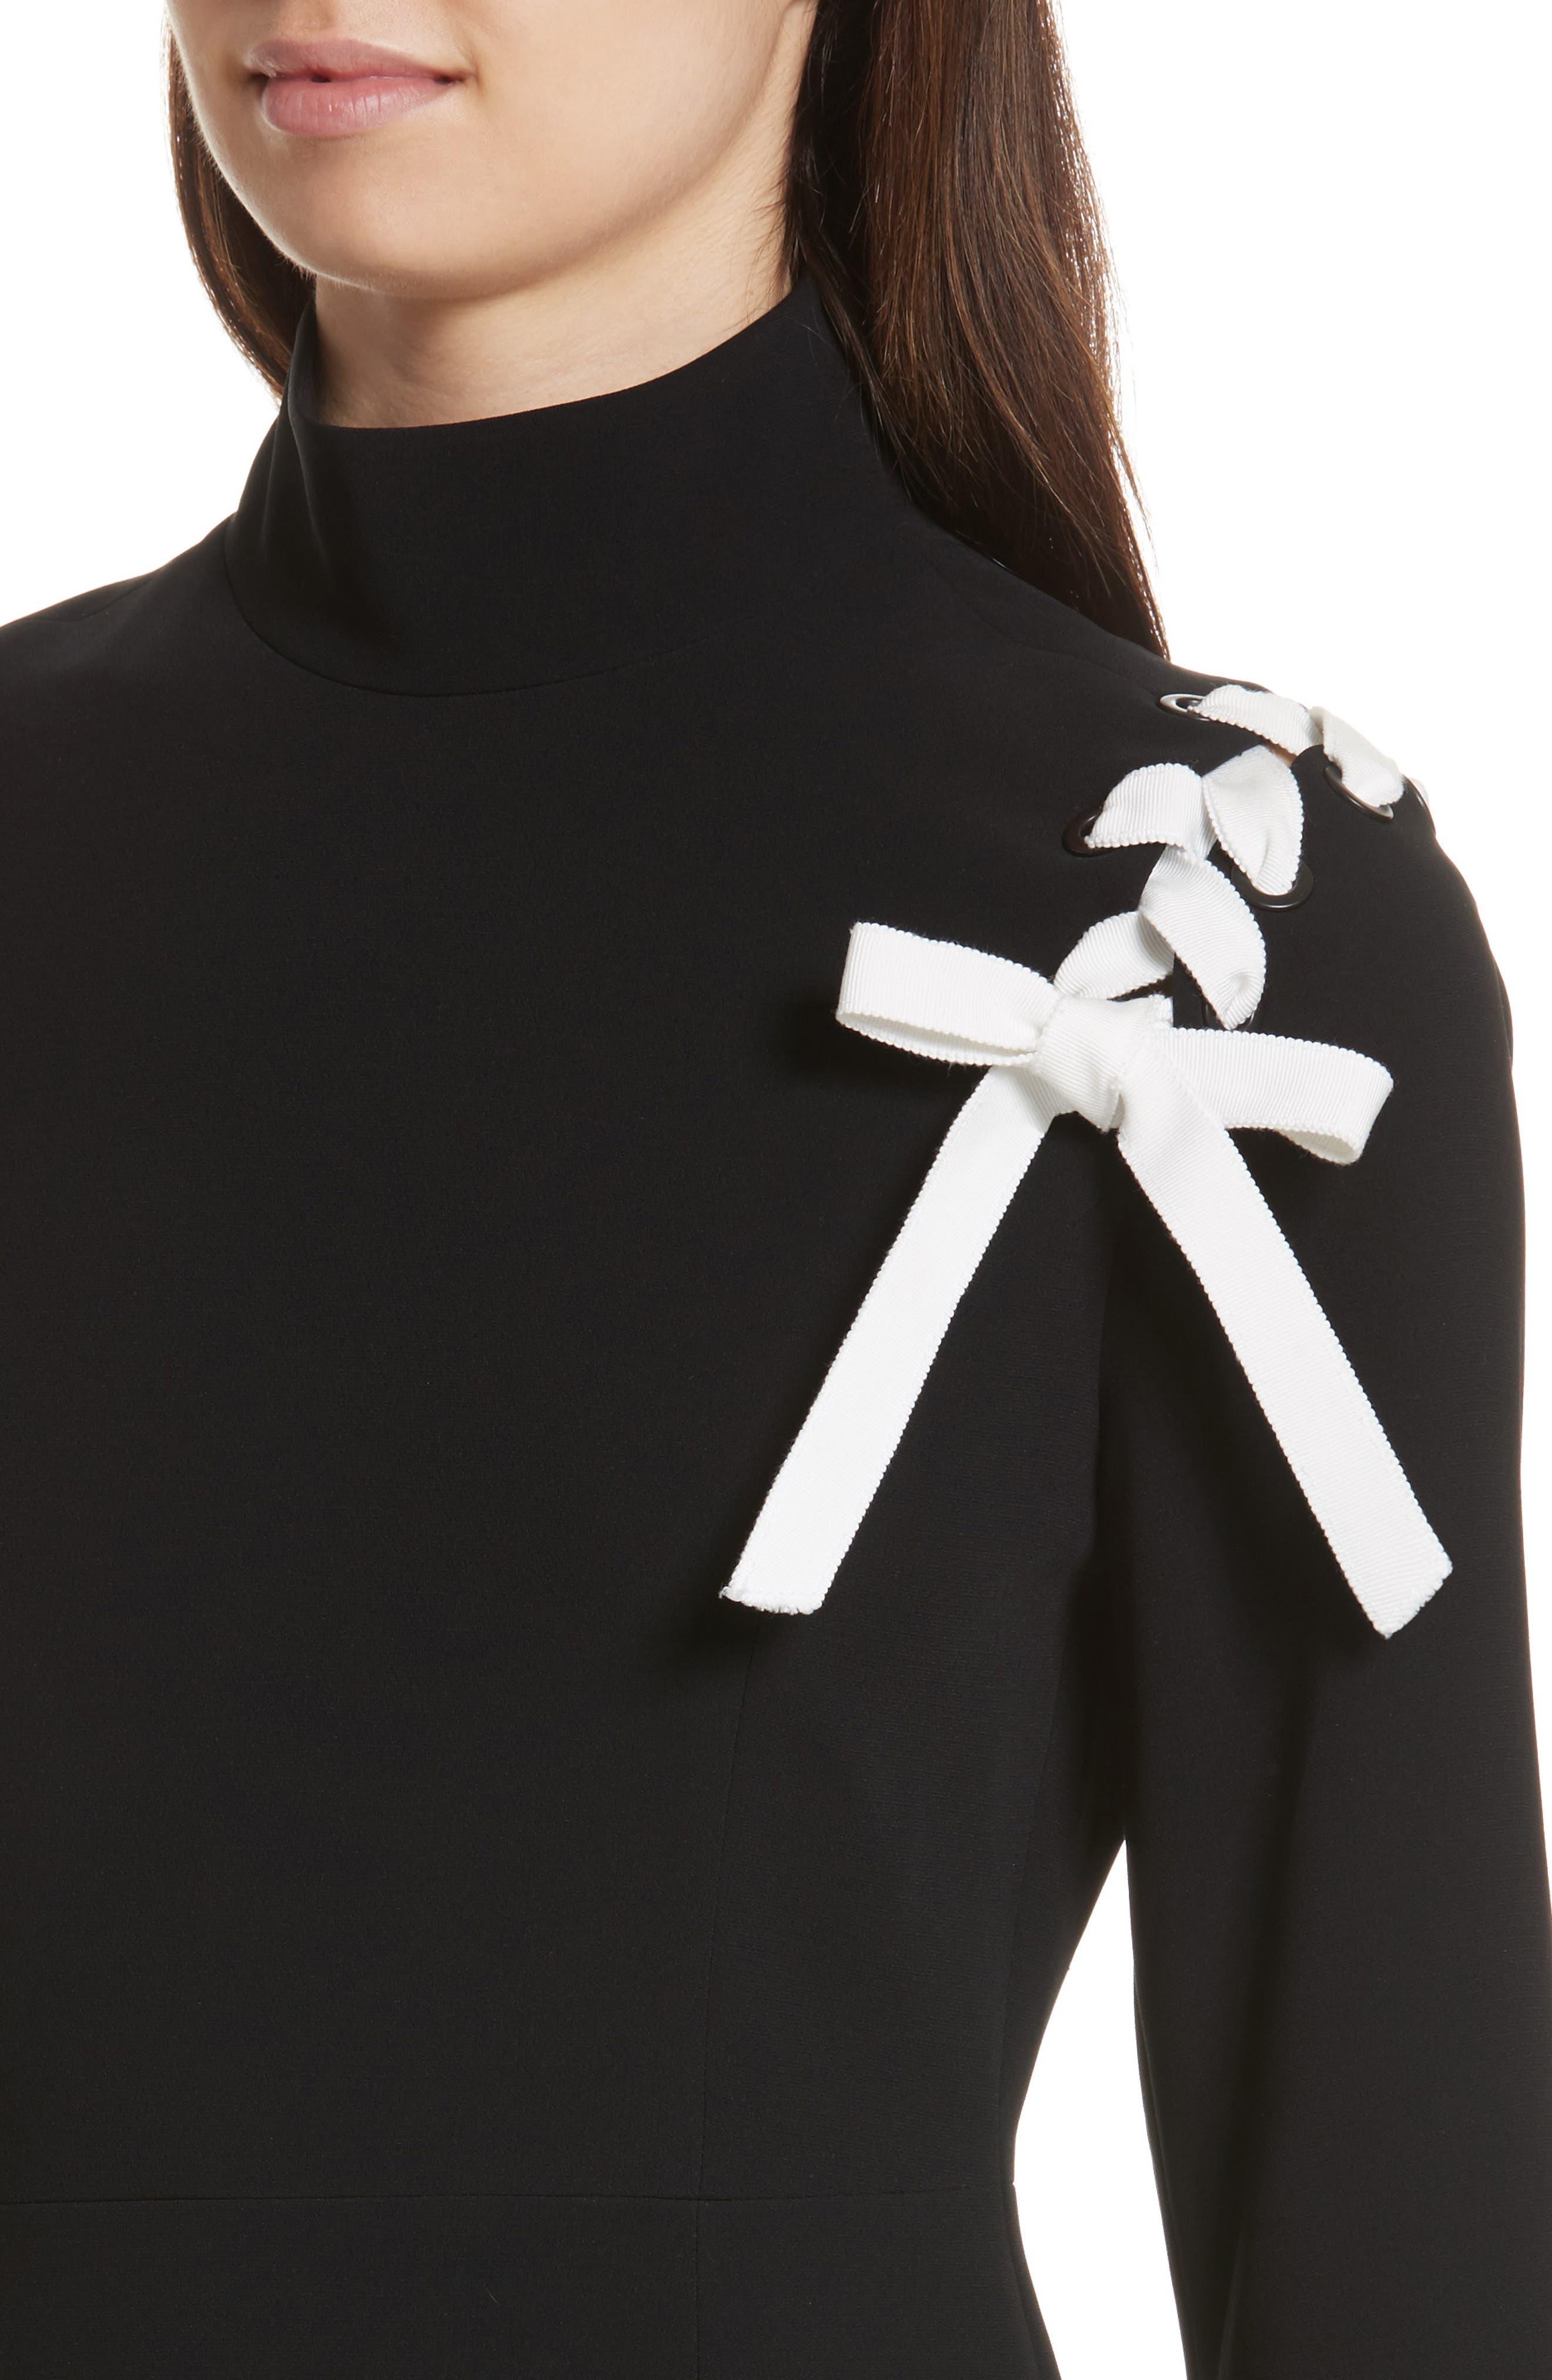 Izella Crepe Minidress,                             Alternate thumbnail 4, color,                             Black/ Ivory